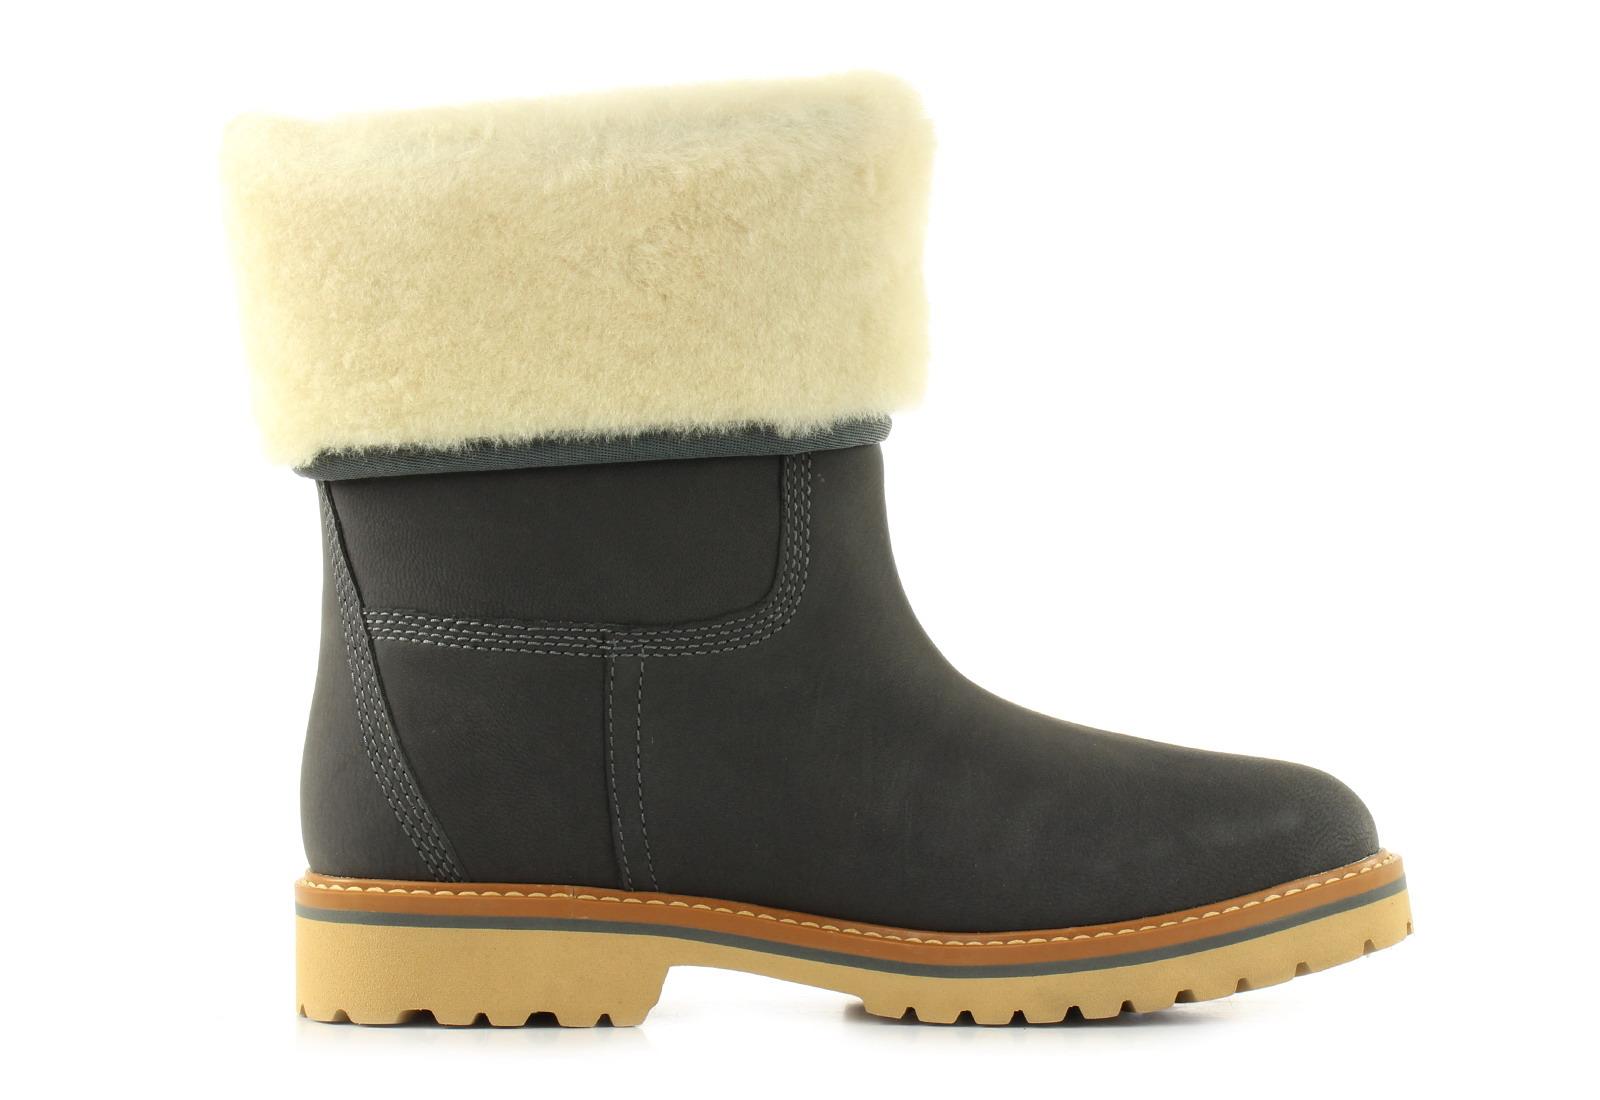 efd13fd0dfa70 Timberland Boots - Chamonix Valley Wp - A1US4-gar - Online shop for ...